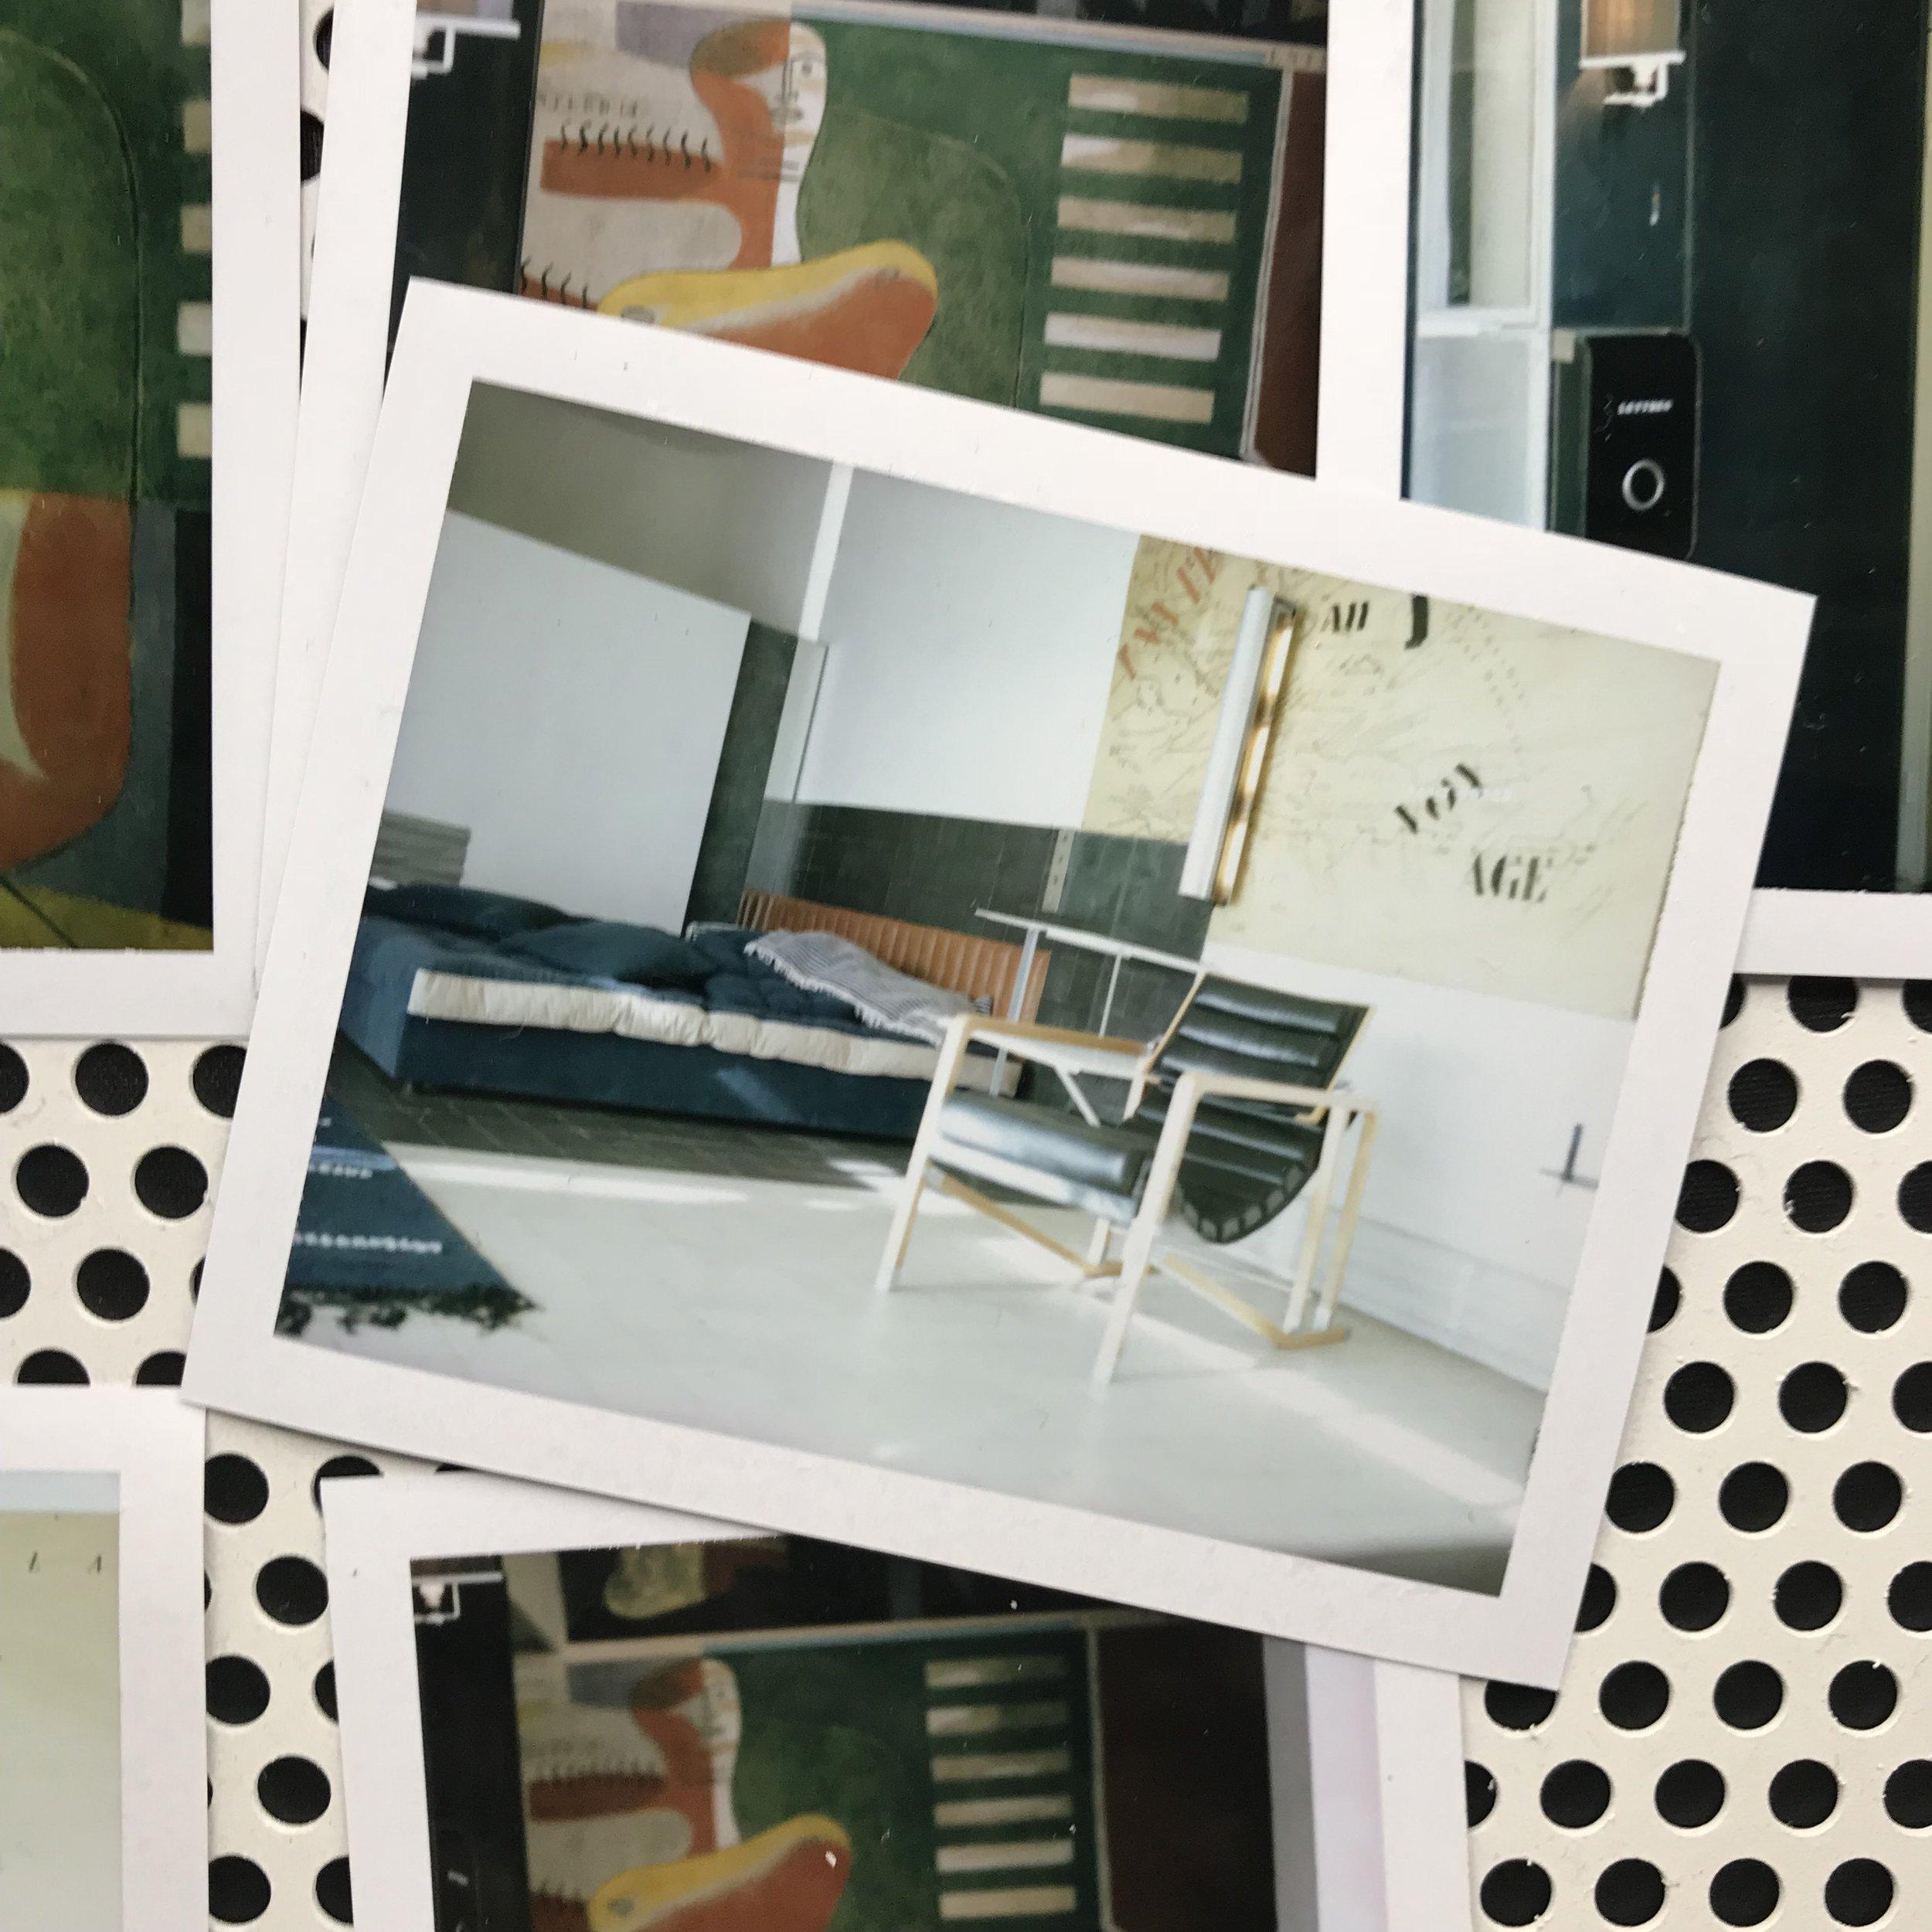 F_Halard Polaroid_E-1027_03.jpg